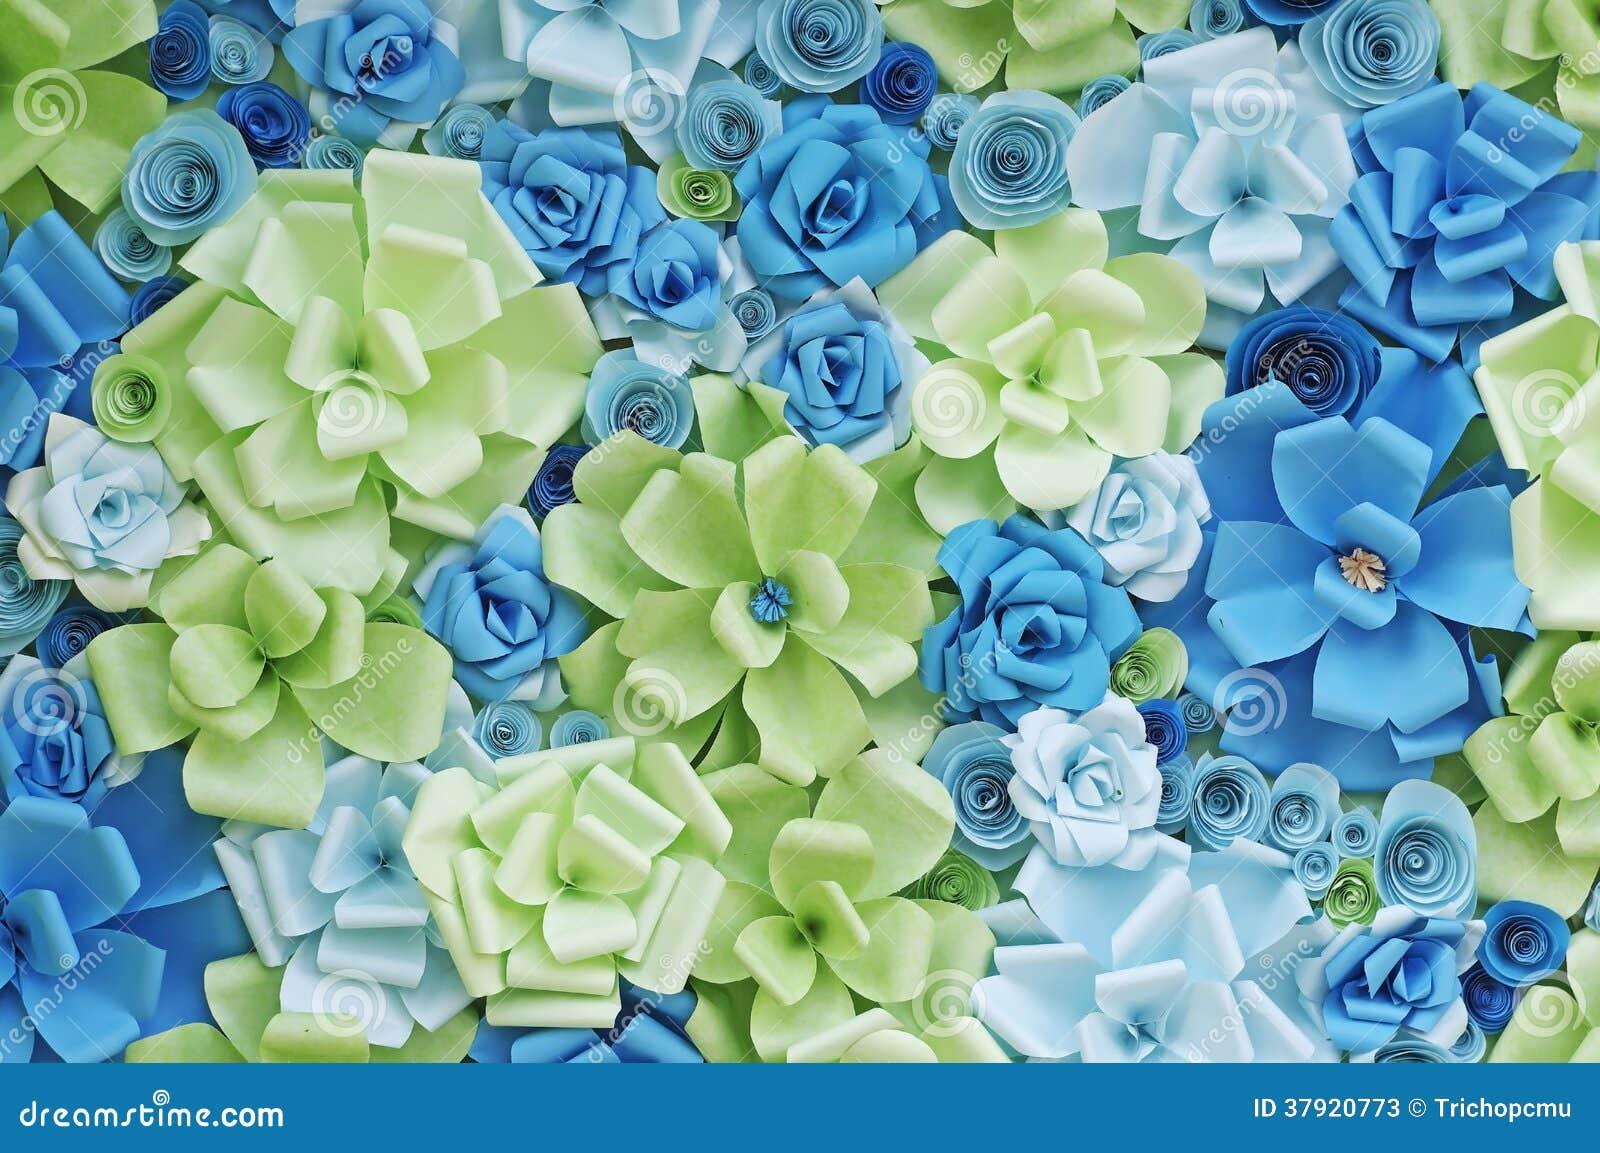 Предпосылка бумажных цветков